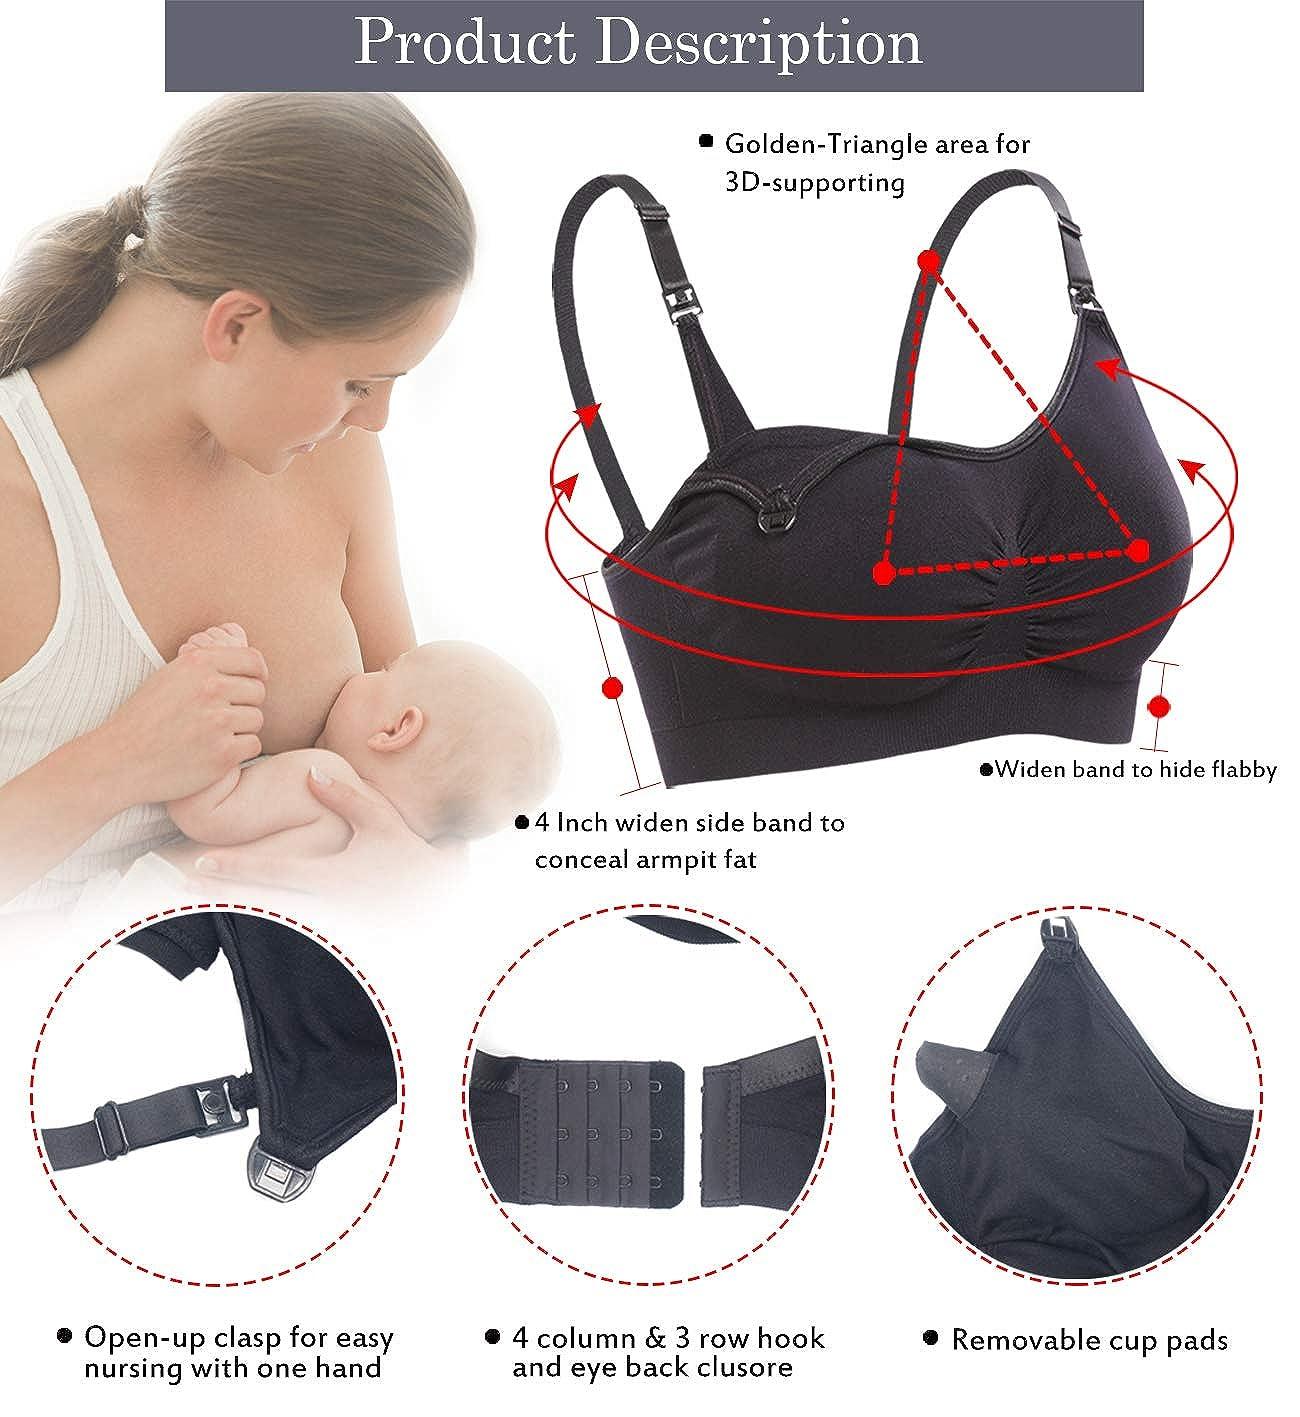 LYSHION Womens Cotton Spandex Seamless Full Coverage Nursing Bra for Breastfeeding-1 Pack